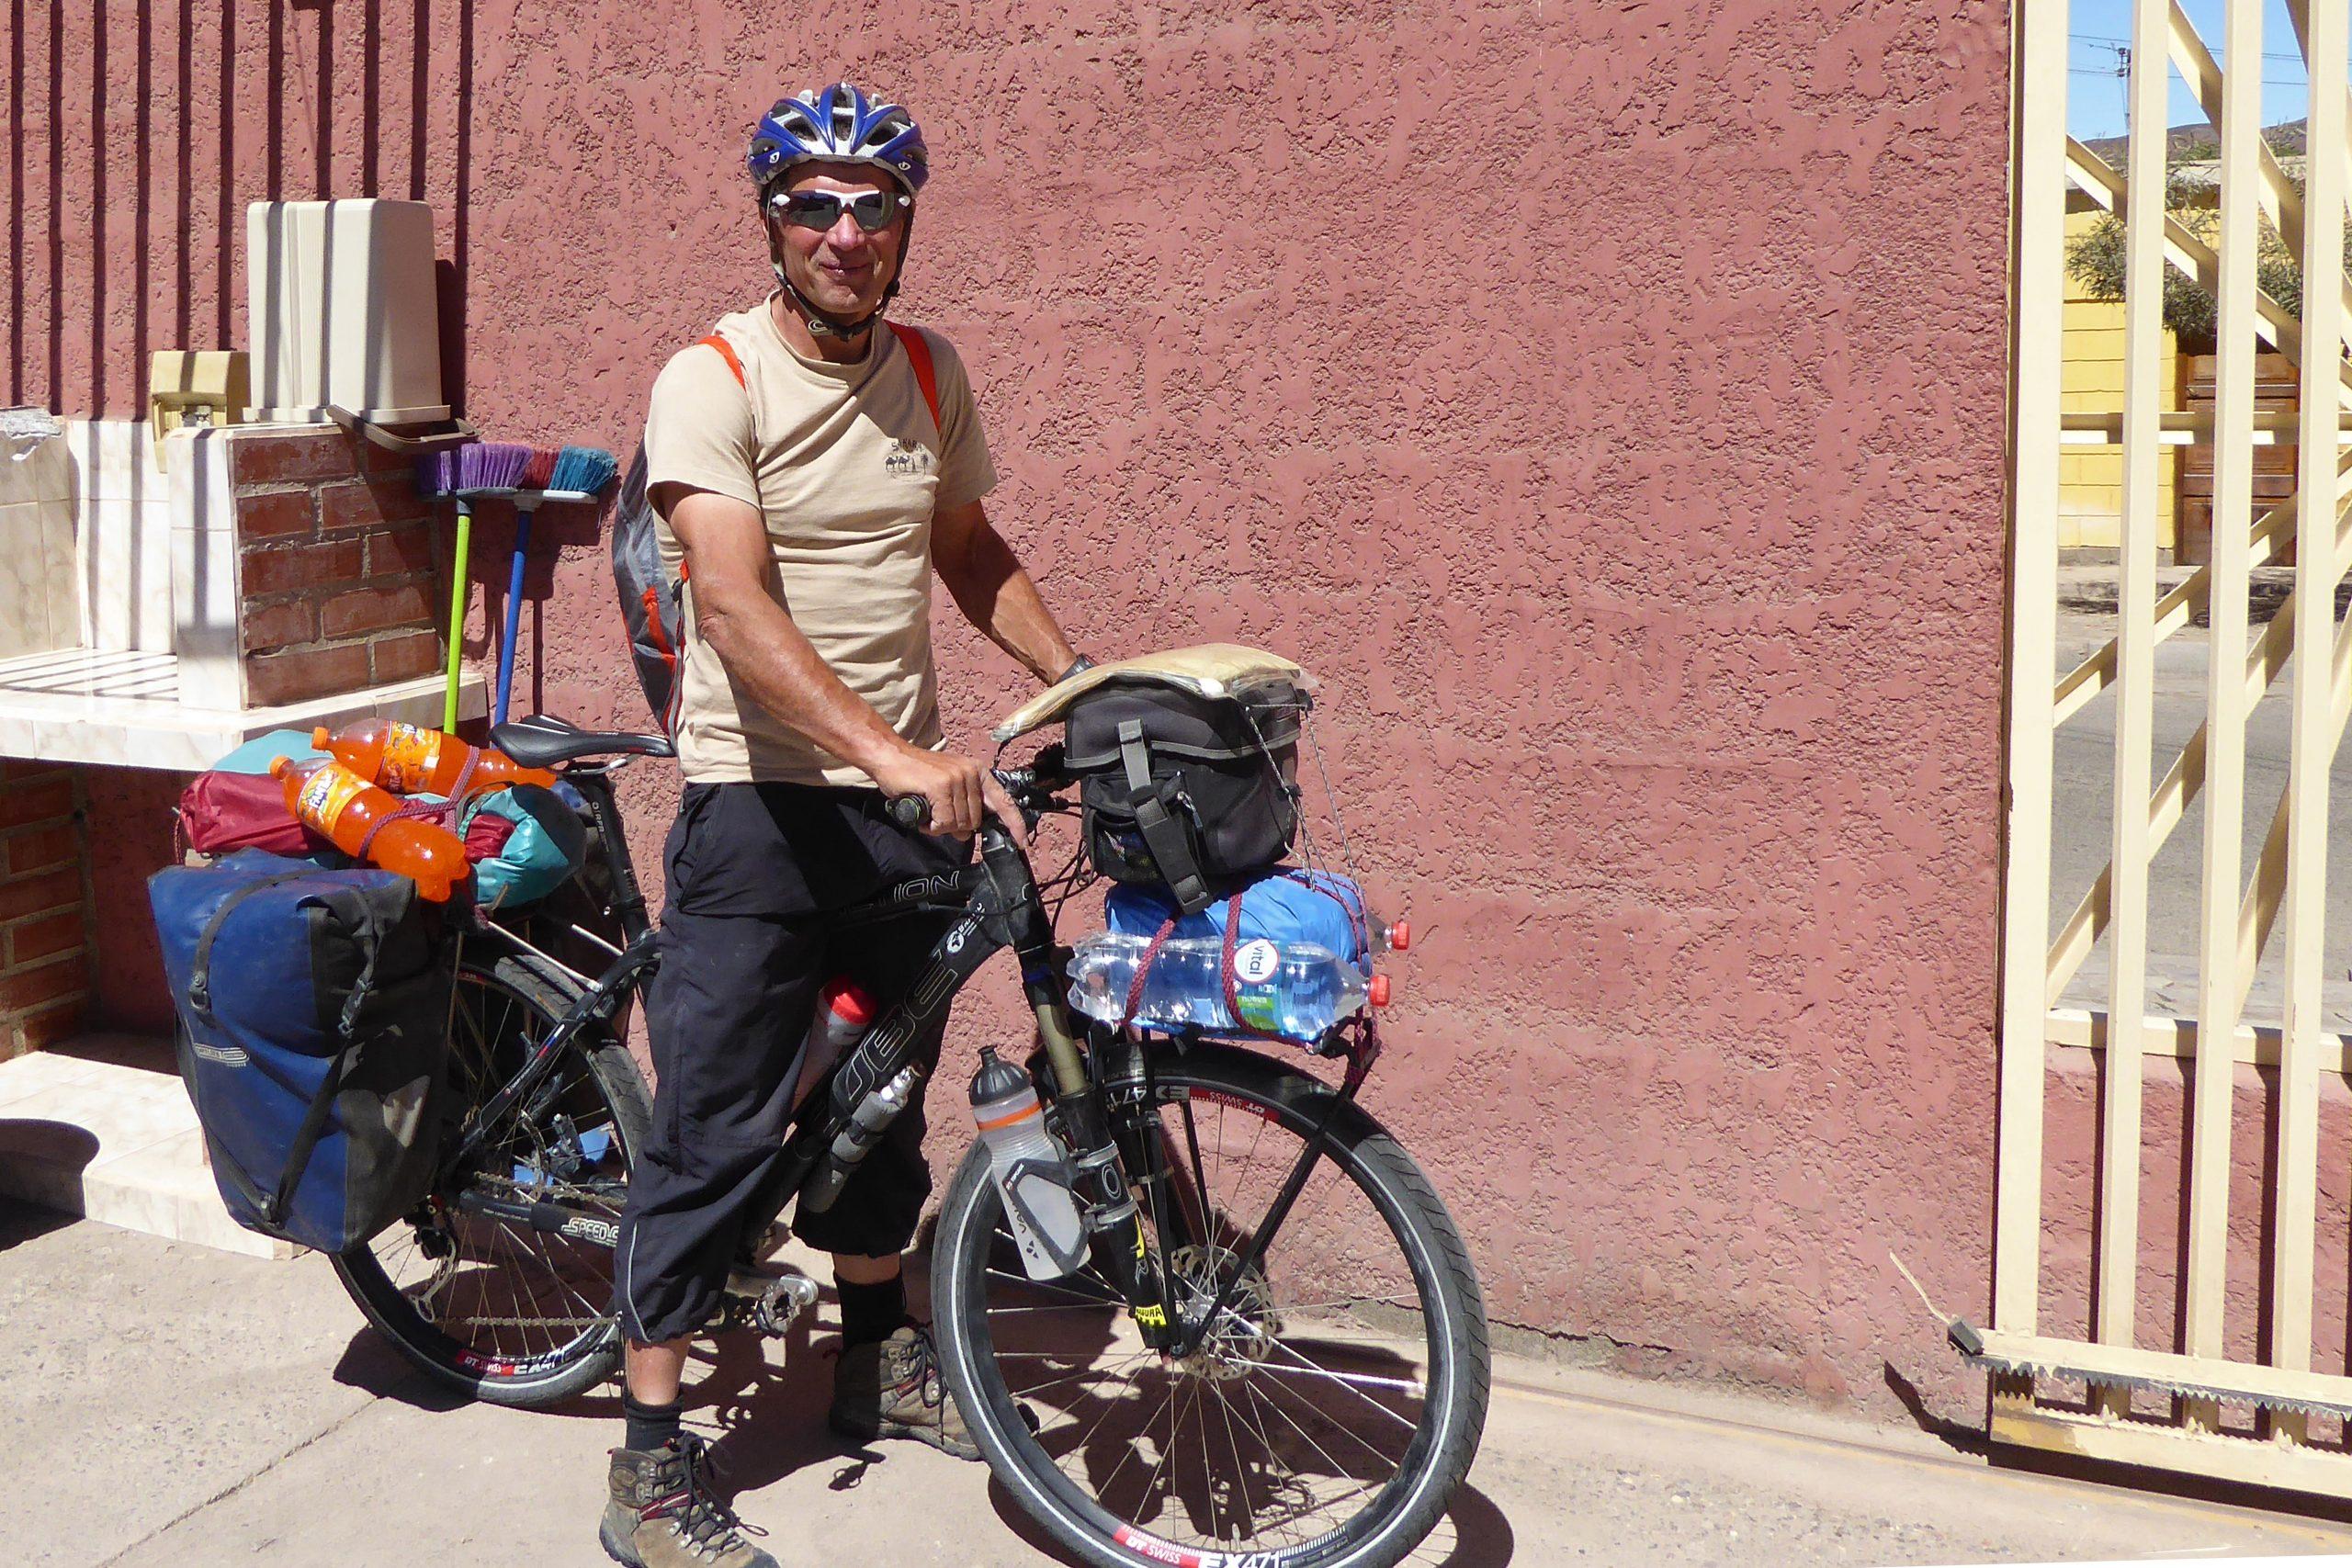 Radreise Südamerika 2019 - Abfahrt zum Ojos de Salado